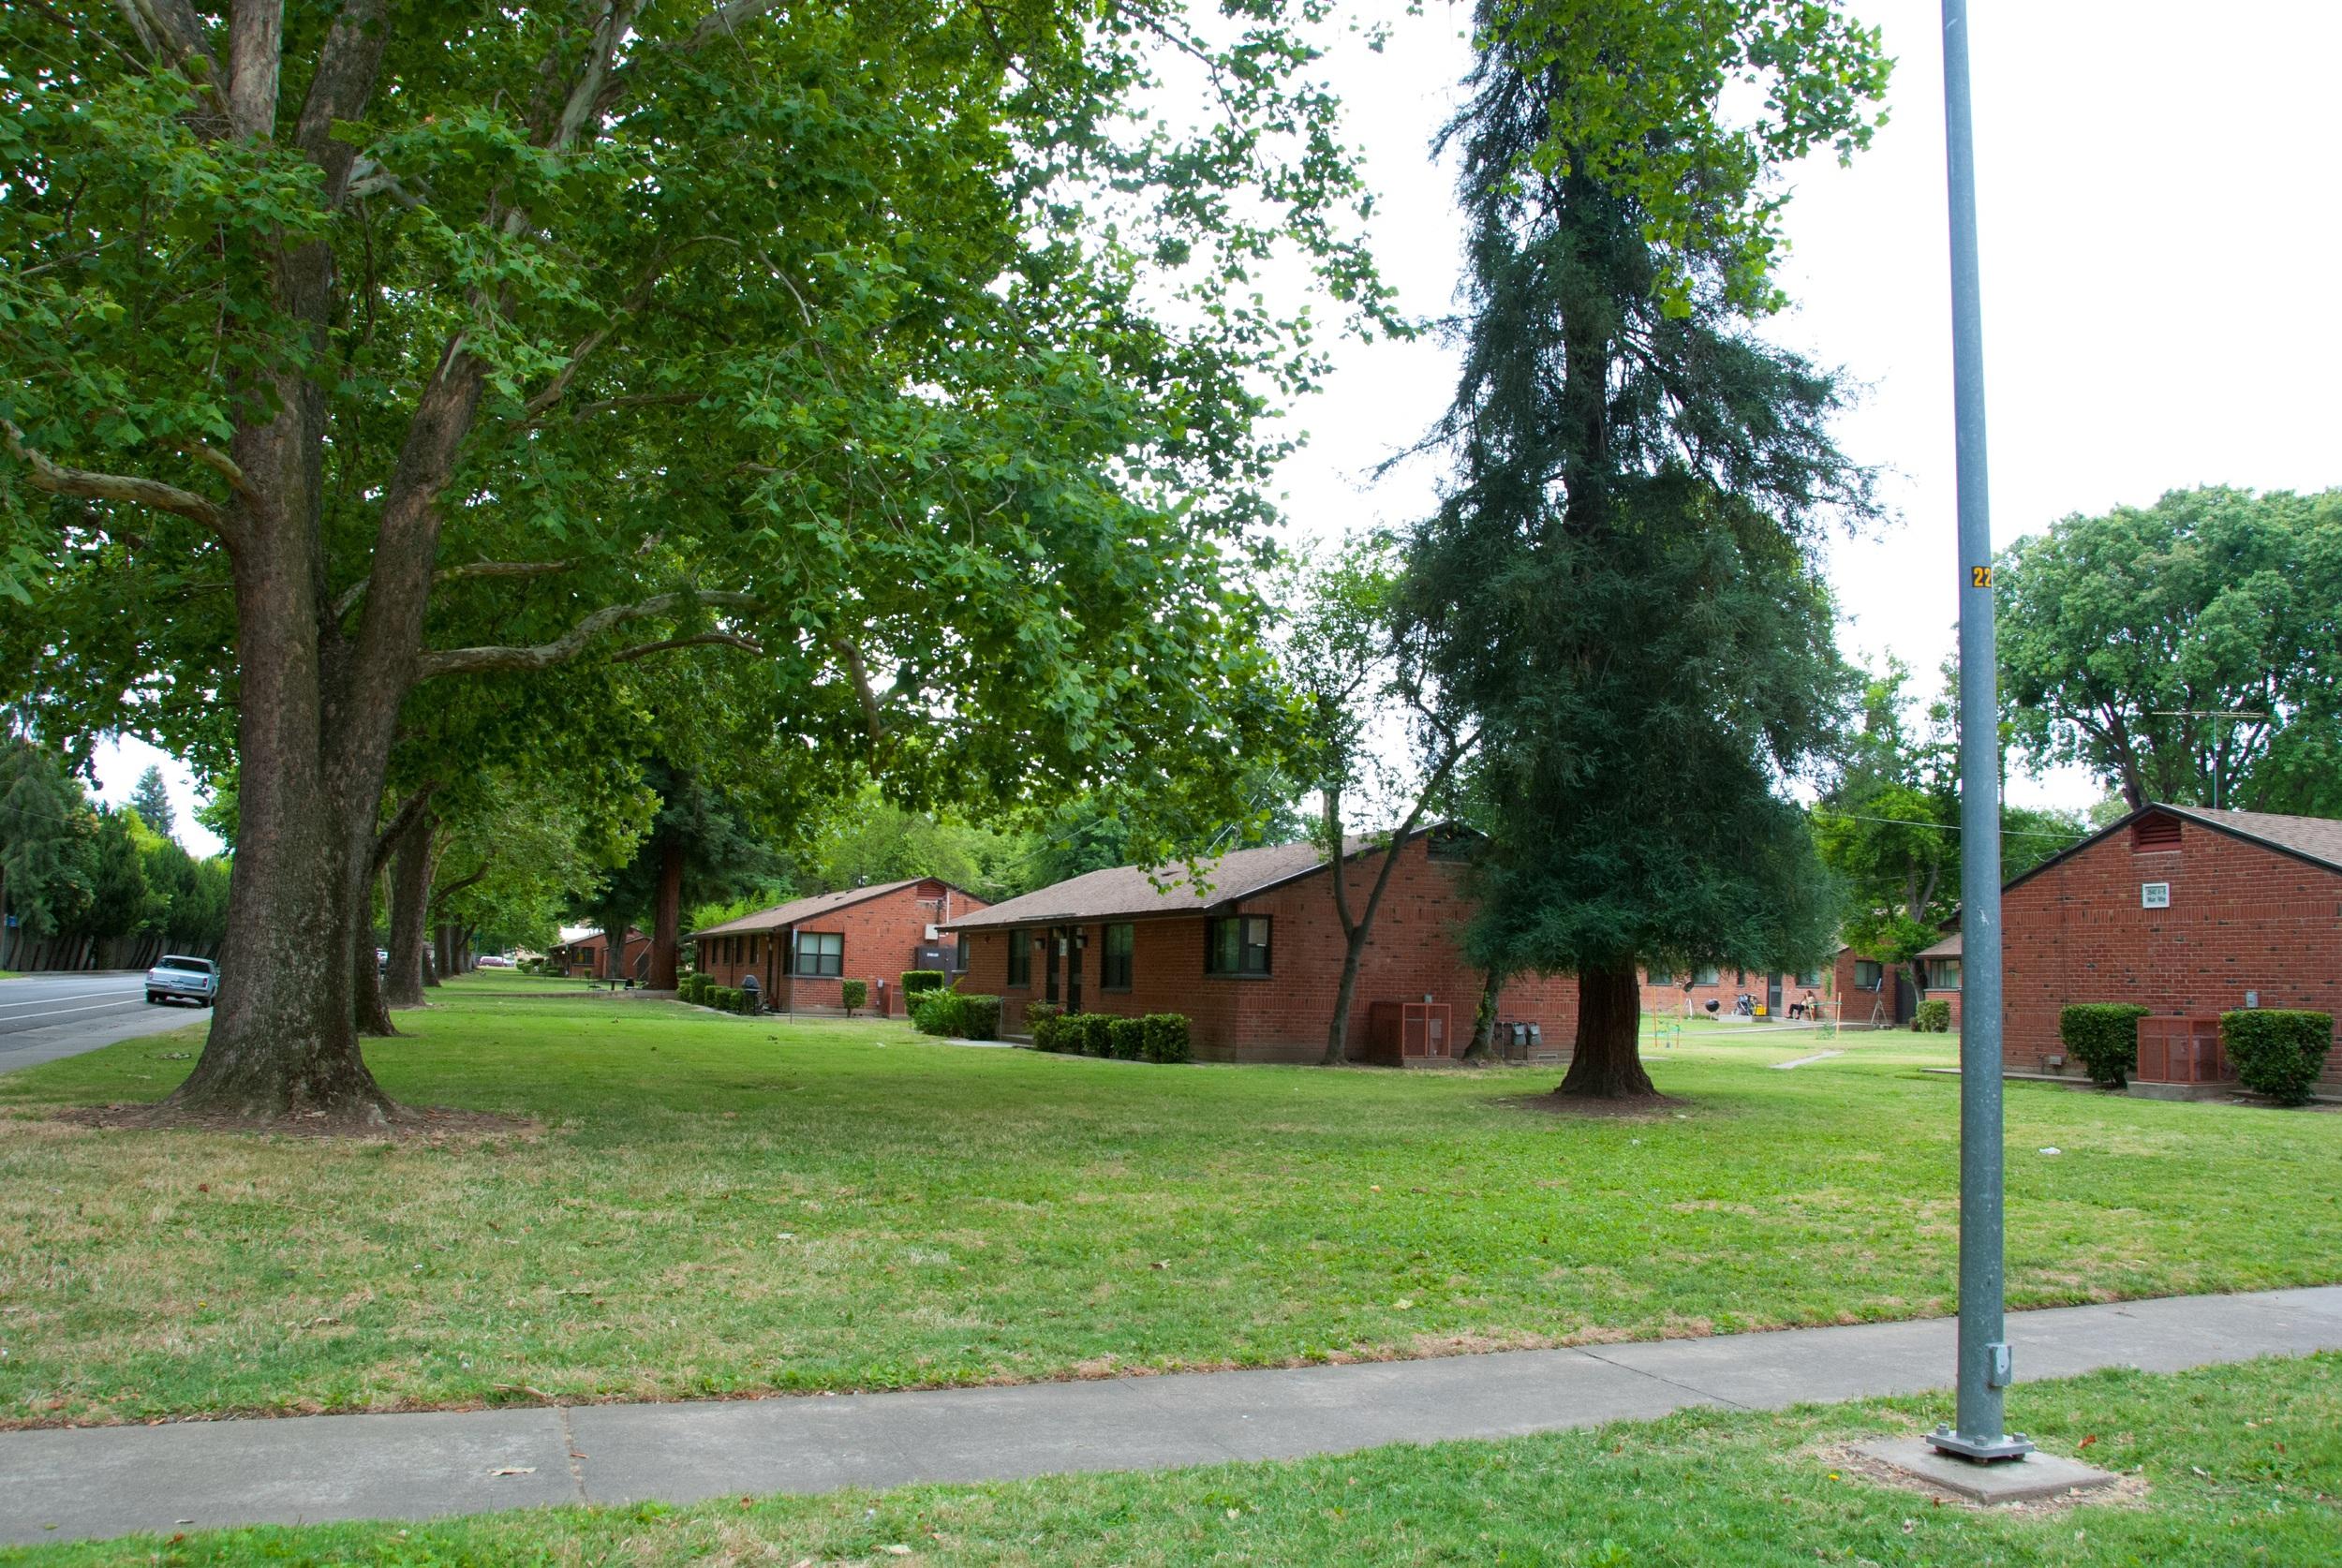 CA_Sacramento_New_Helvetia_Historic_District_0002.jpg